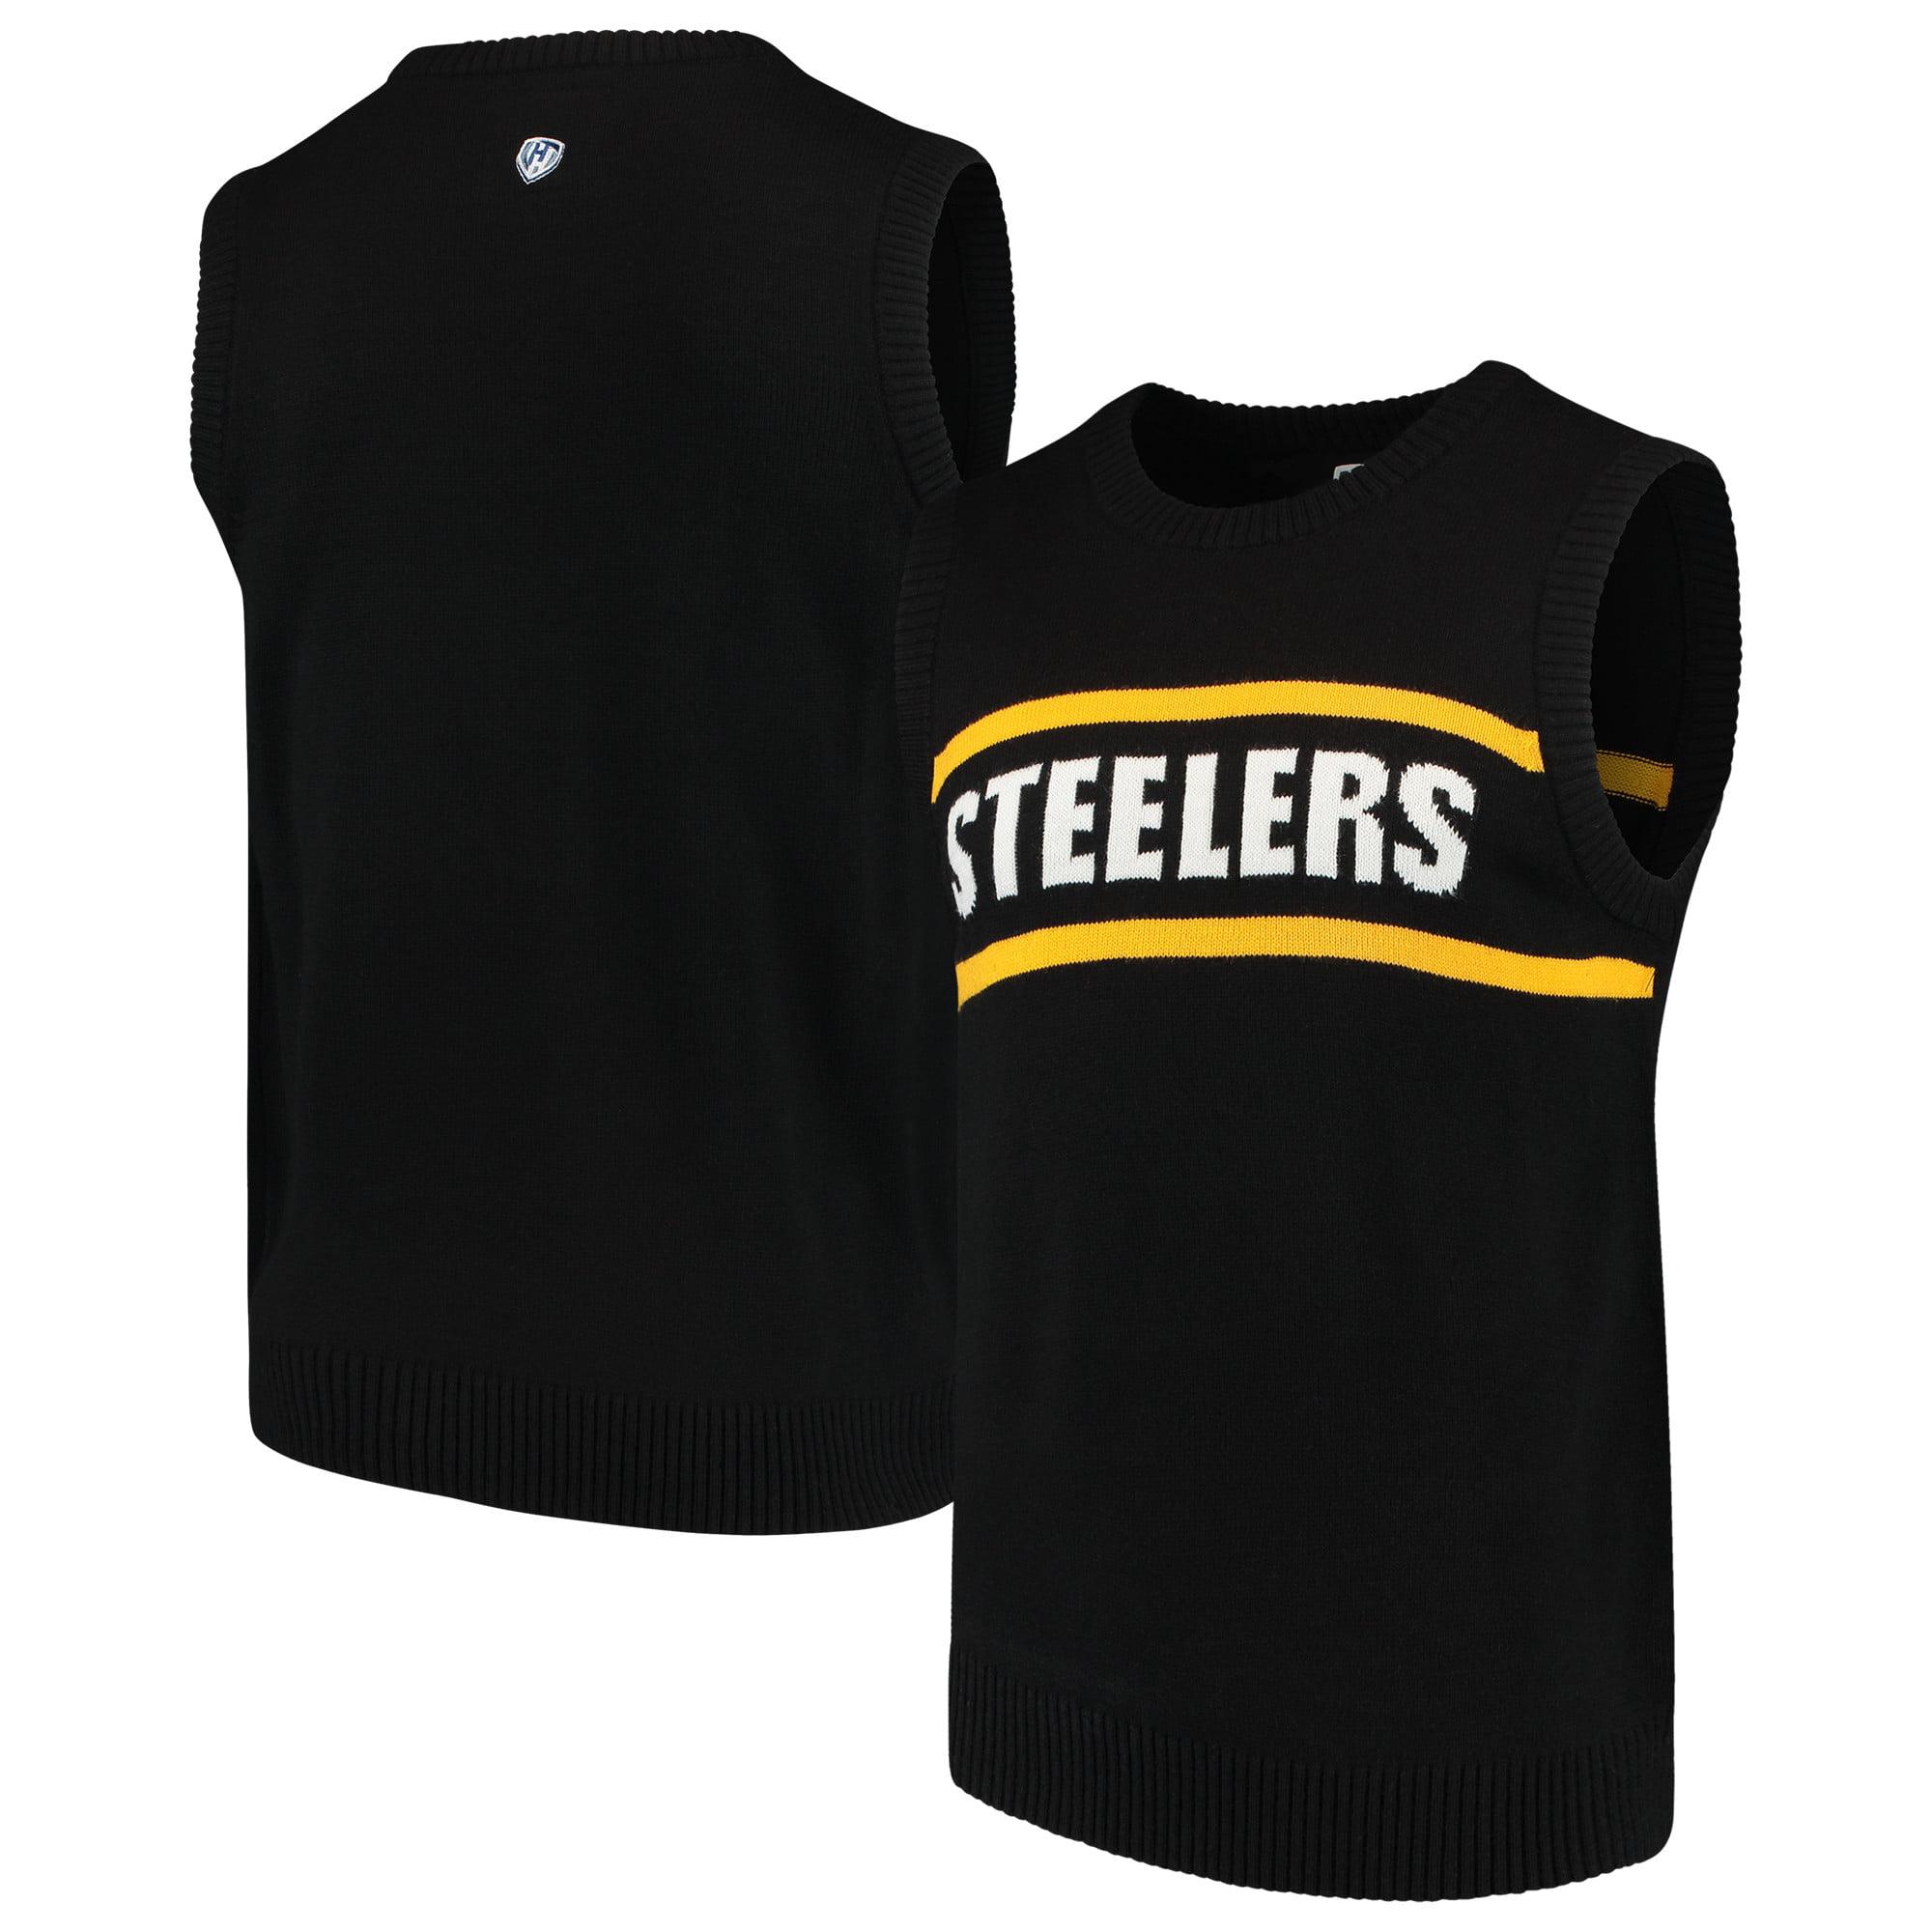 Pittsburgh Steelers G-III Sports by Carl Banks Crewneck Sweater Vest - Black